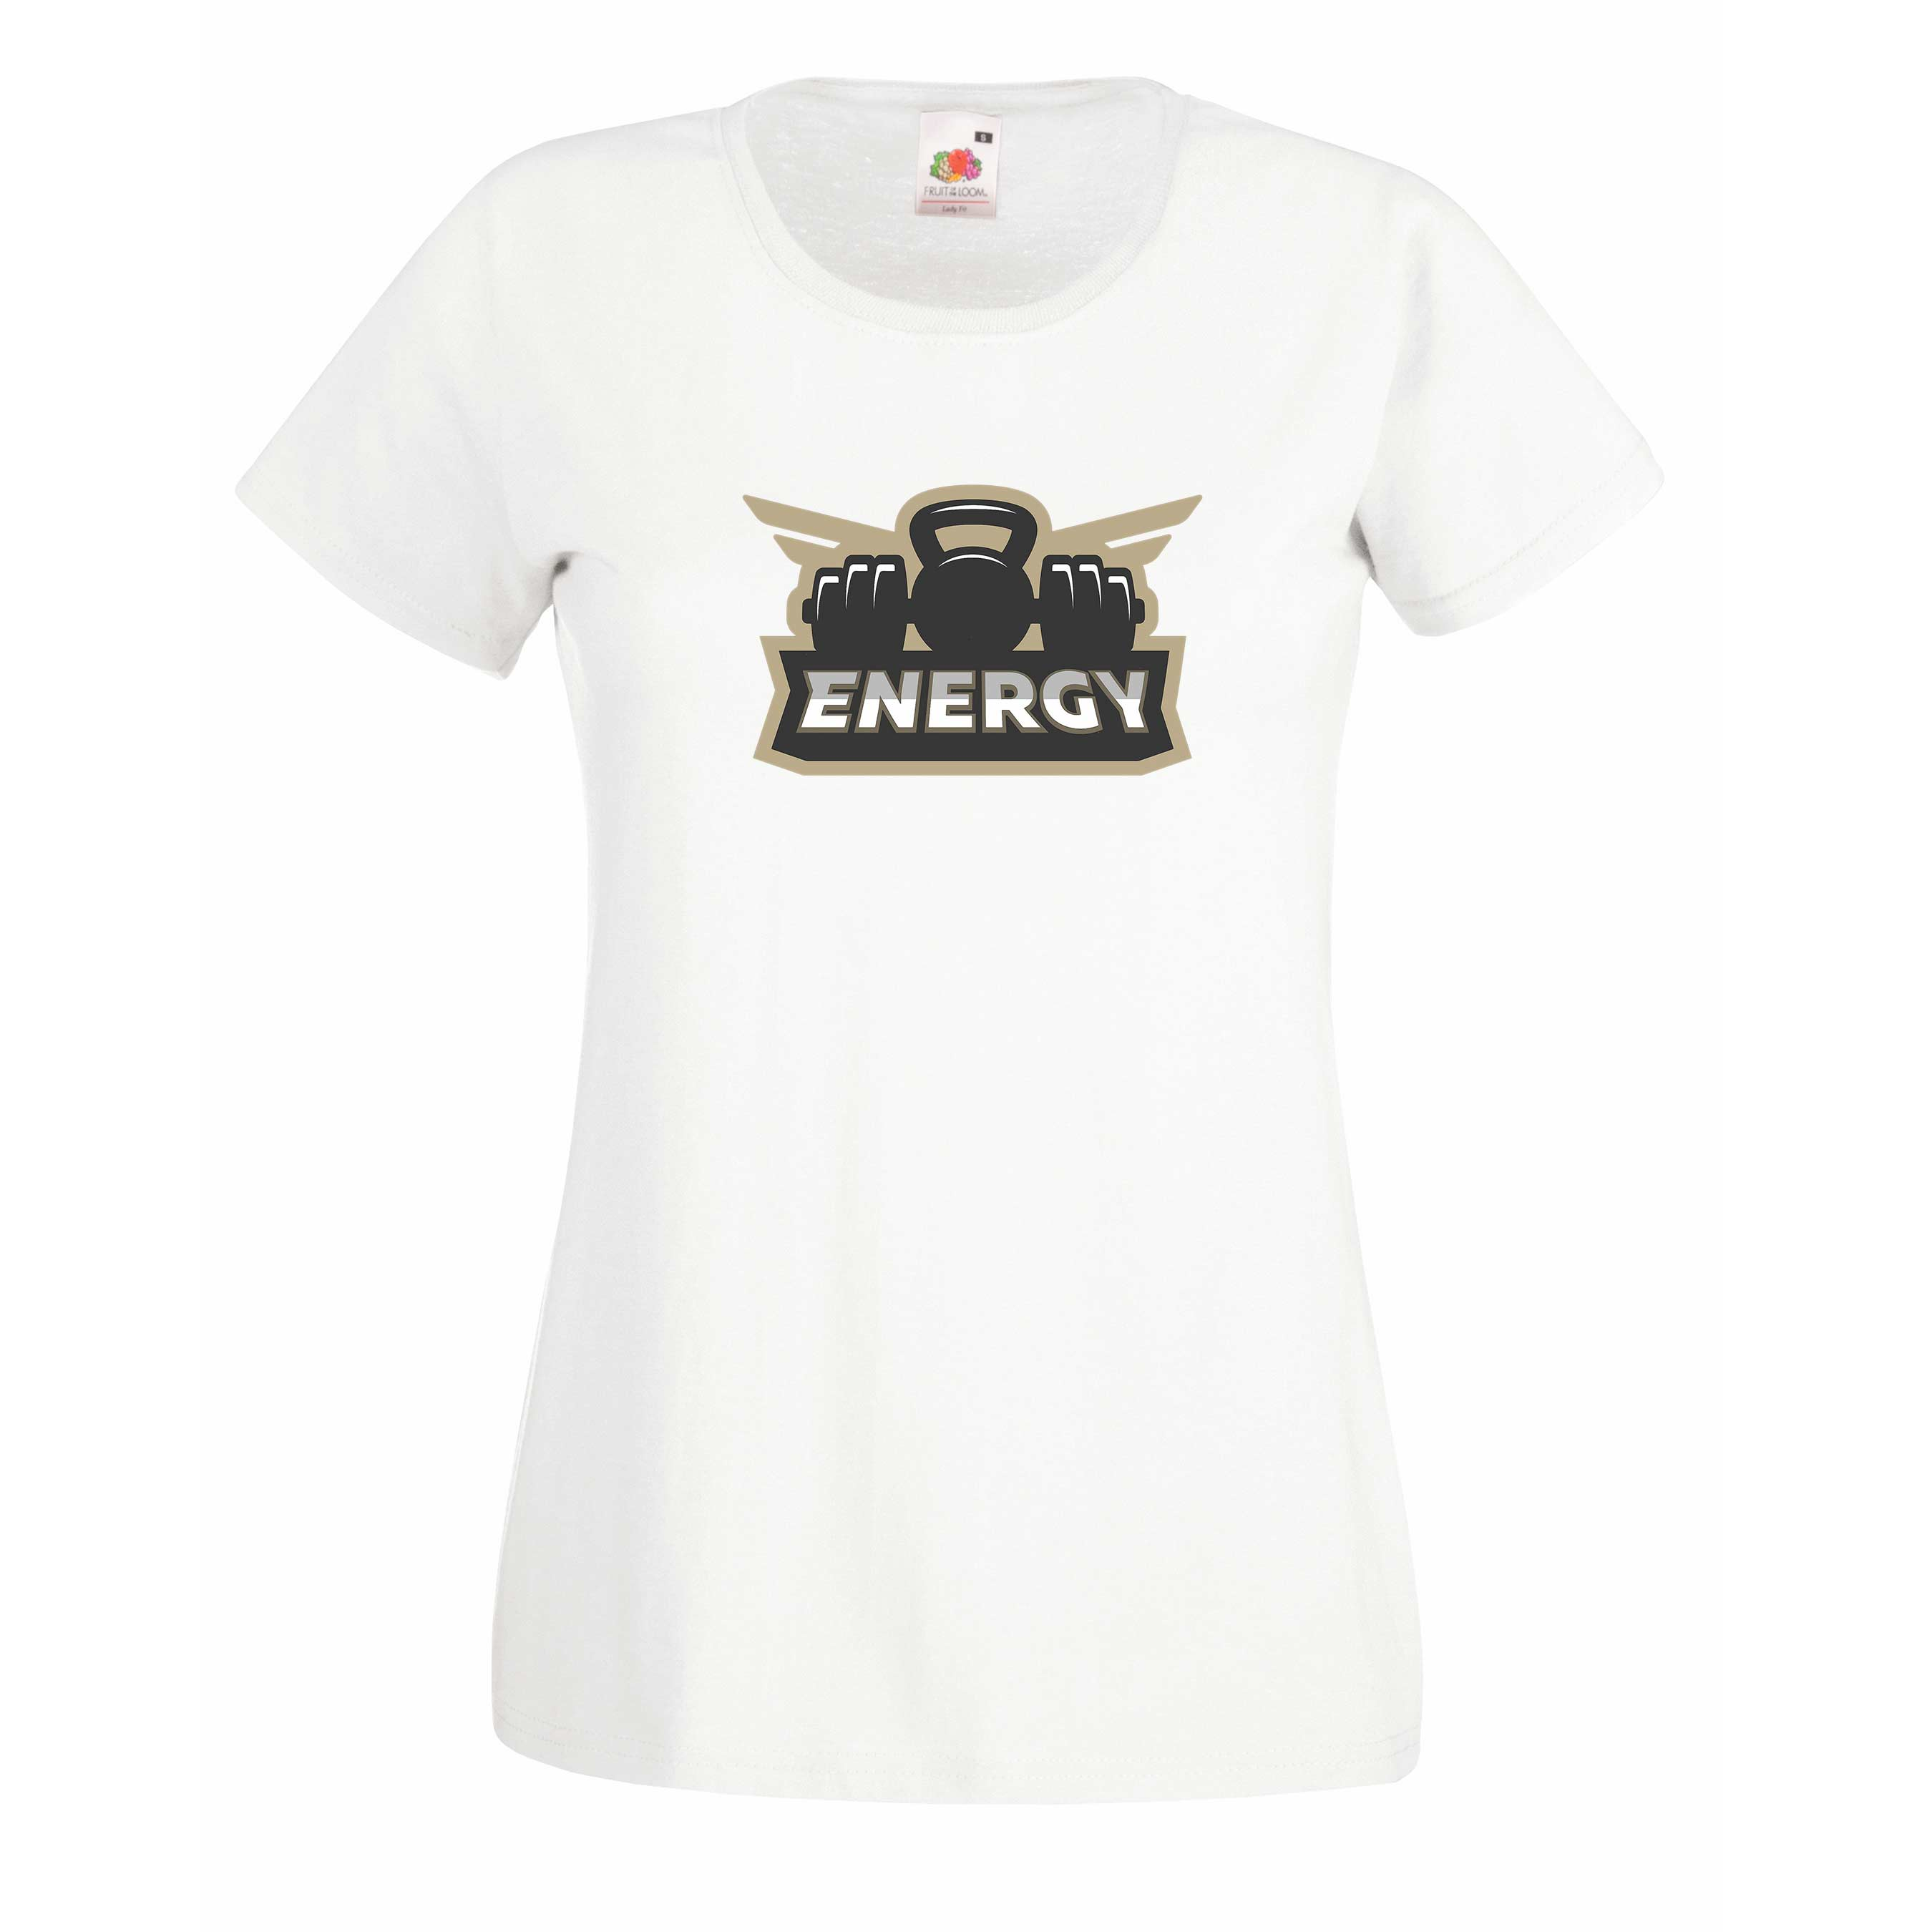 Energy design for t-shirt, hoodie & sweatshirt